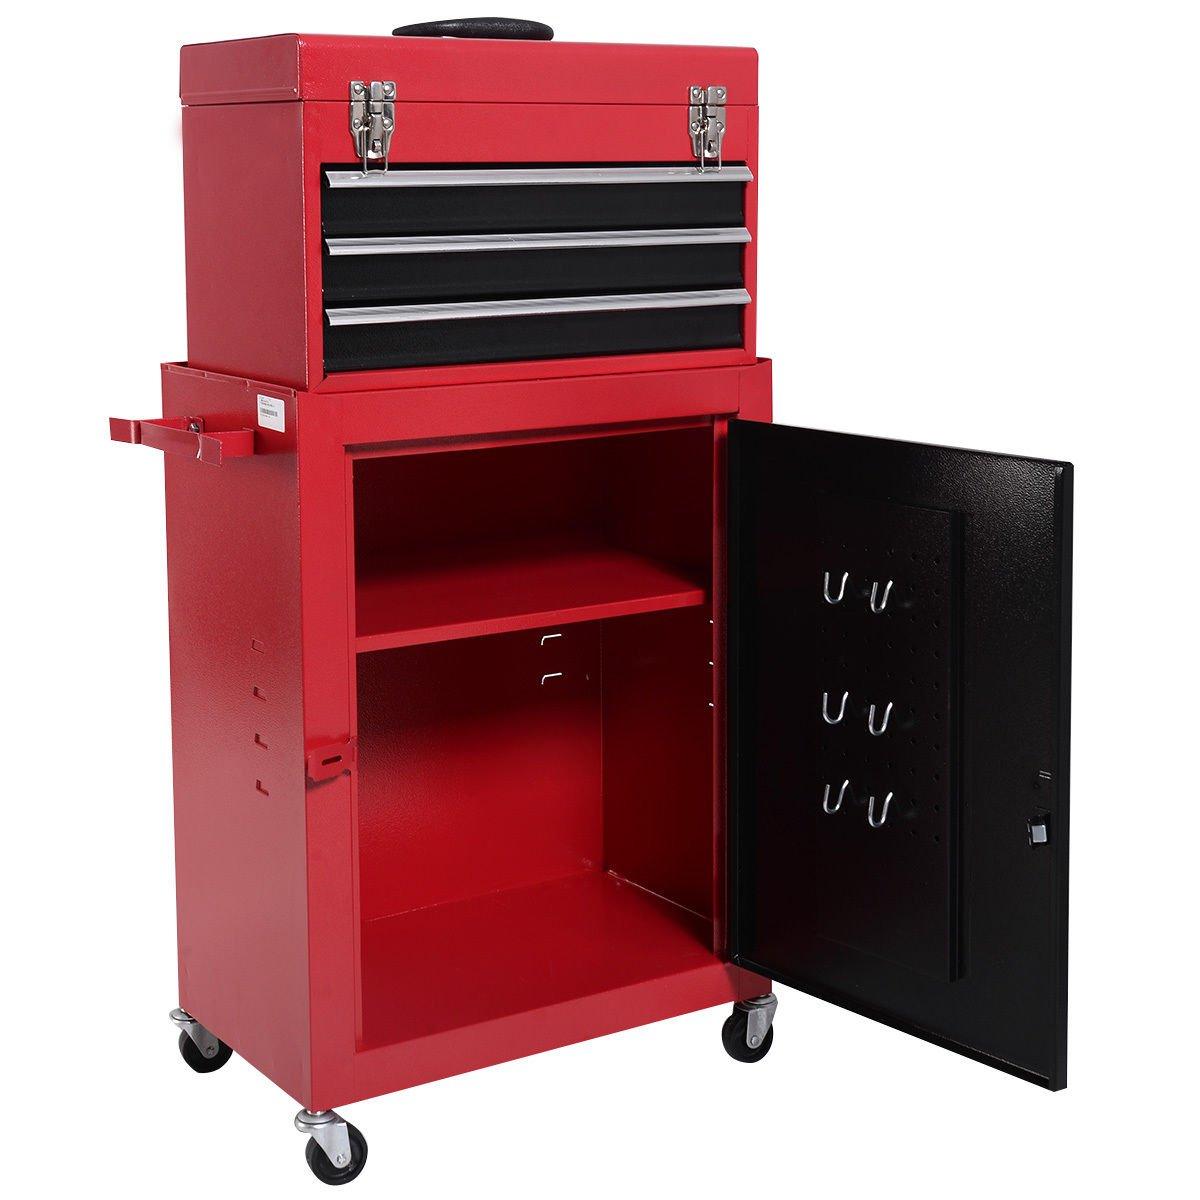 New Red&Black 2pc Mini Tool Chest & Cabinet Storage Box Rolling Garage Toolbox Organizer